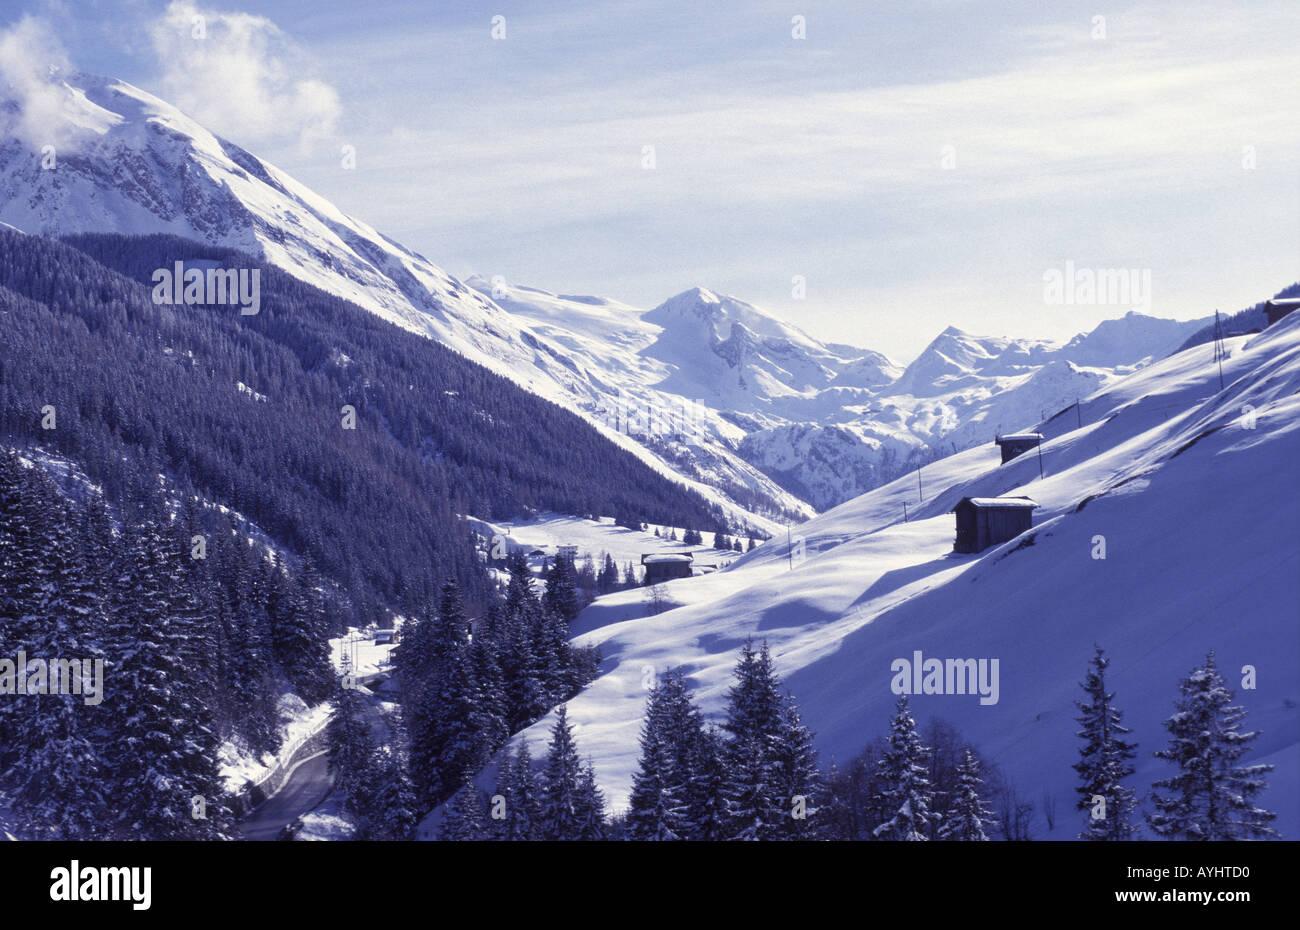 Schneebedeckte Berge - Stock Image